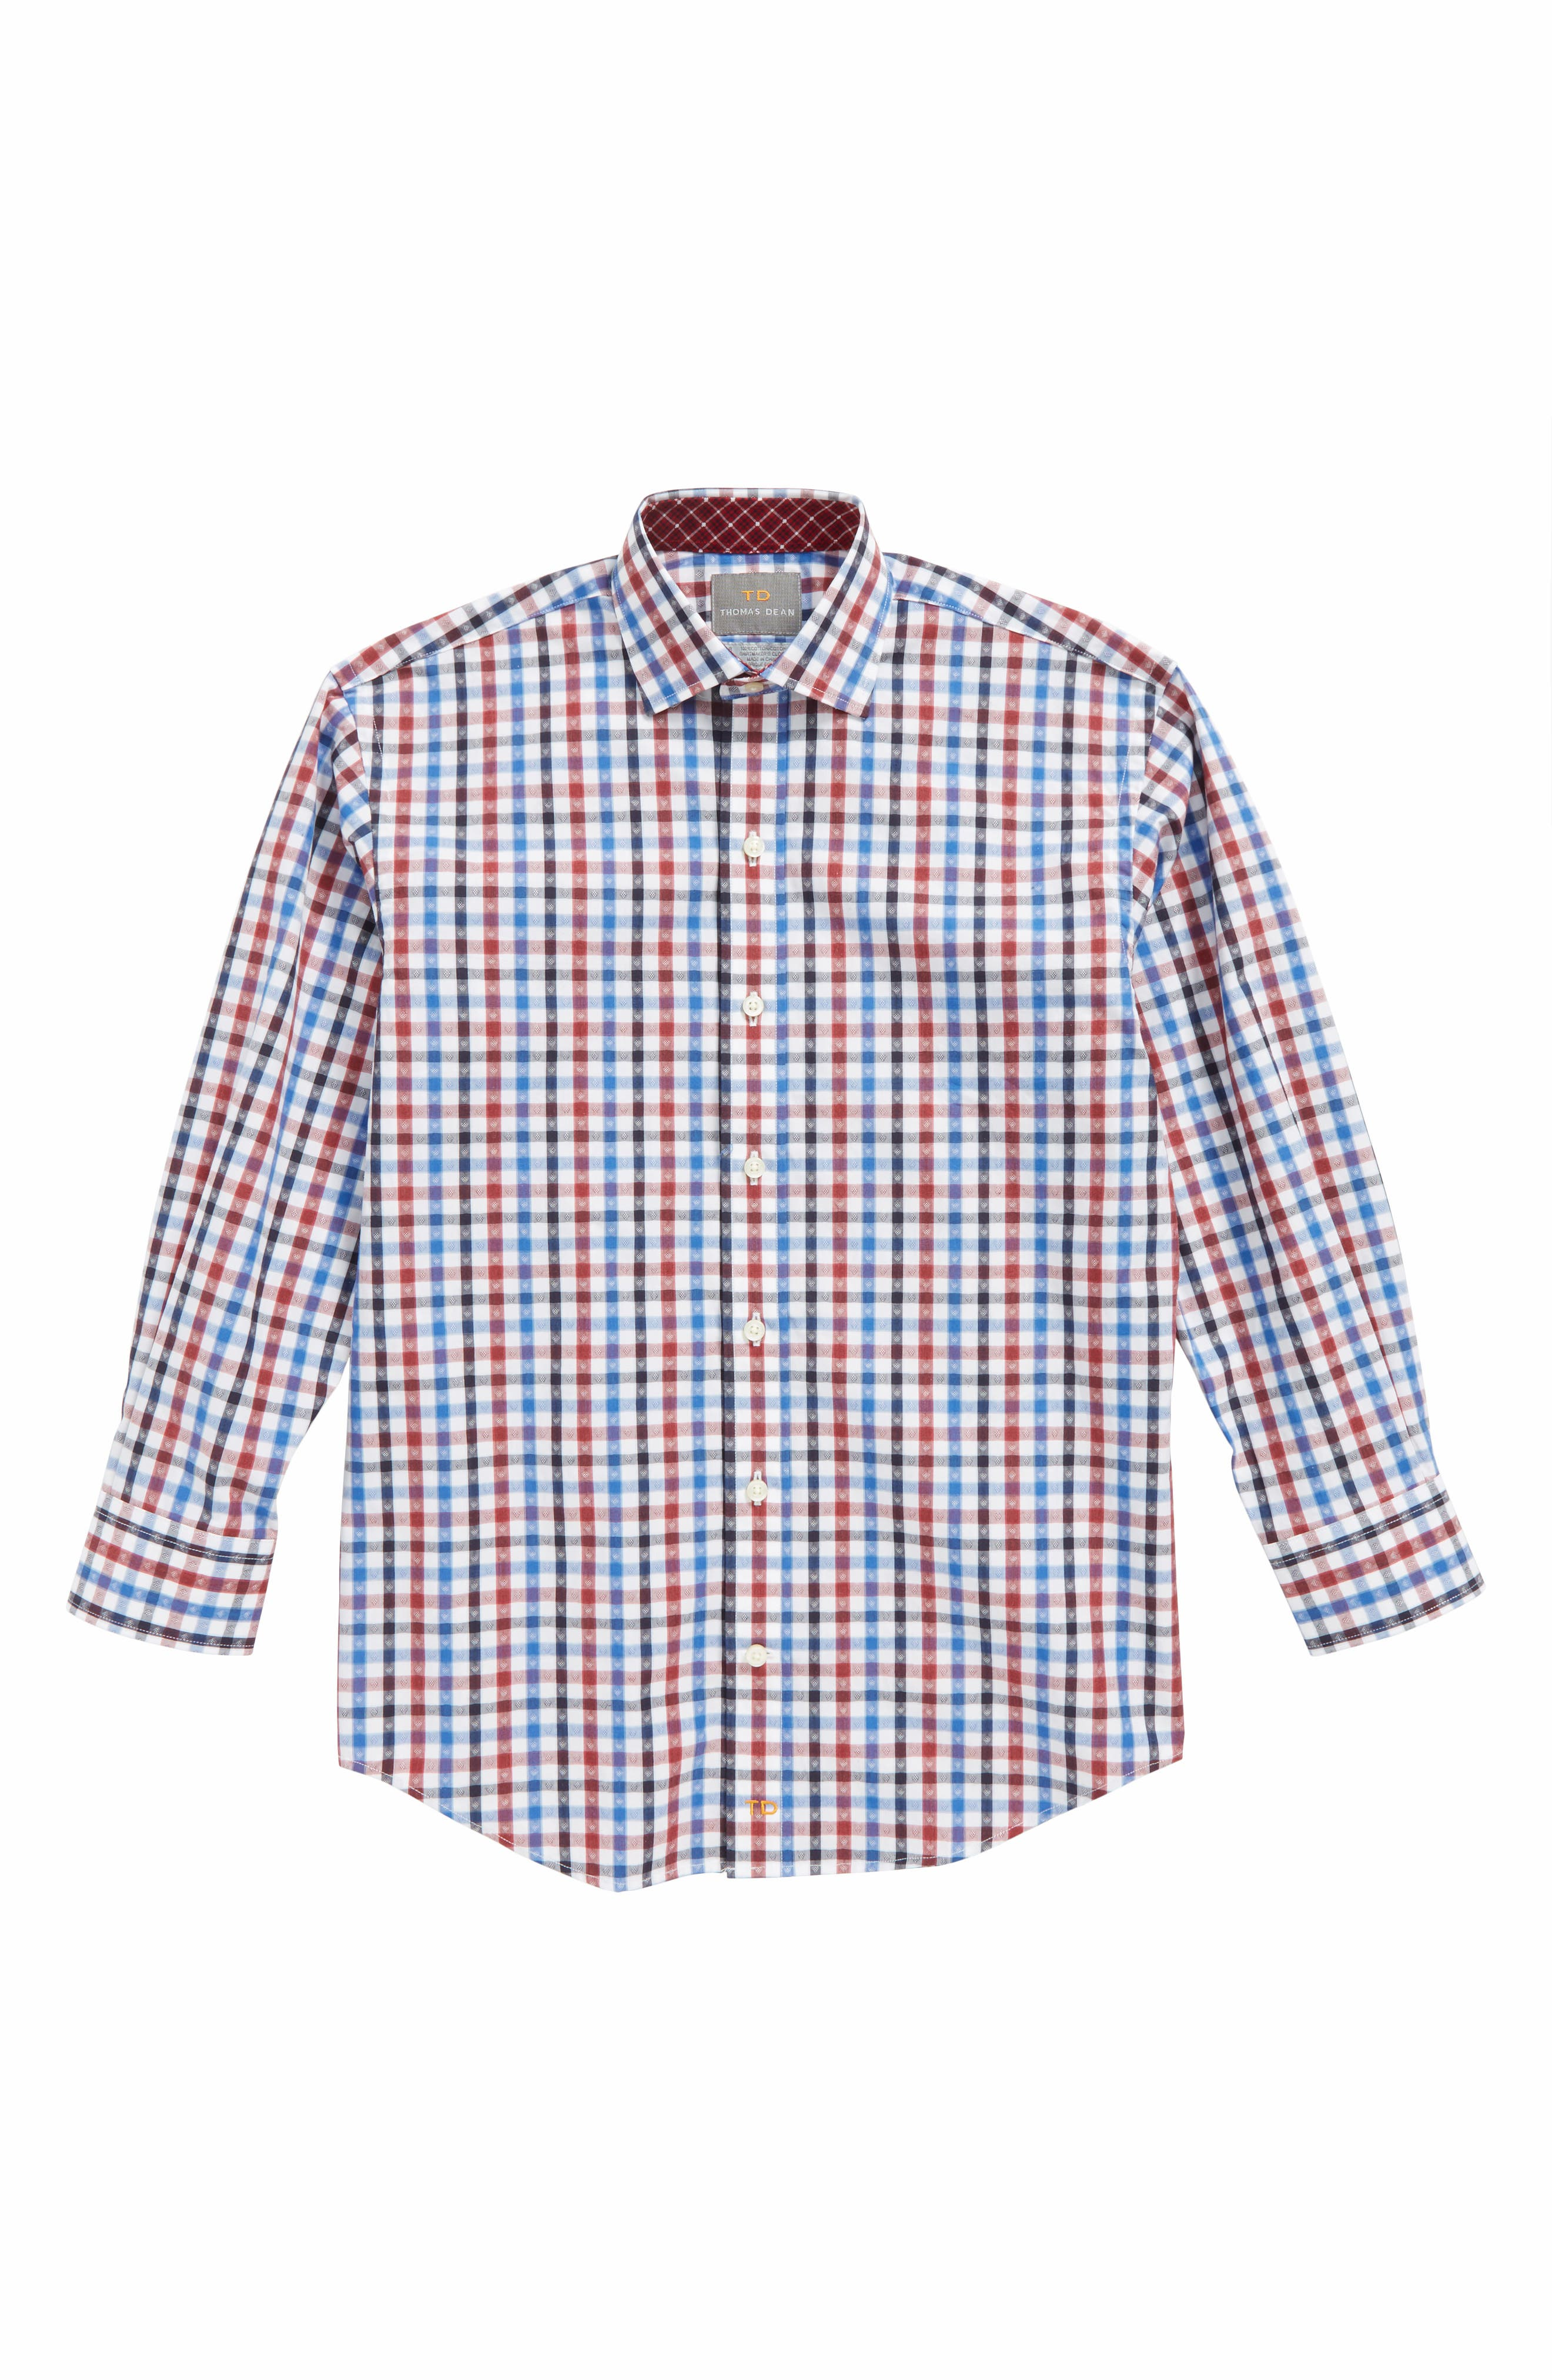 Alternate Image 1 Selected - Thomas Dean Shadow Check Dress Shirt (Big Boys)